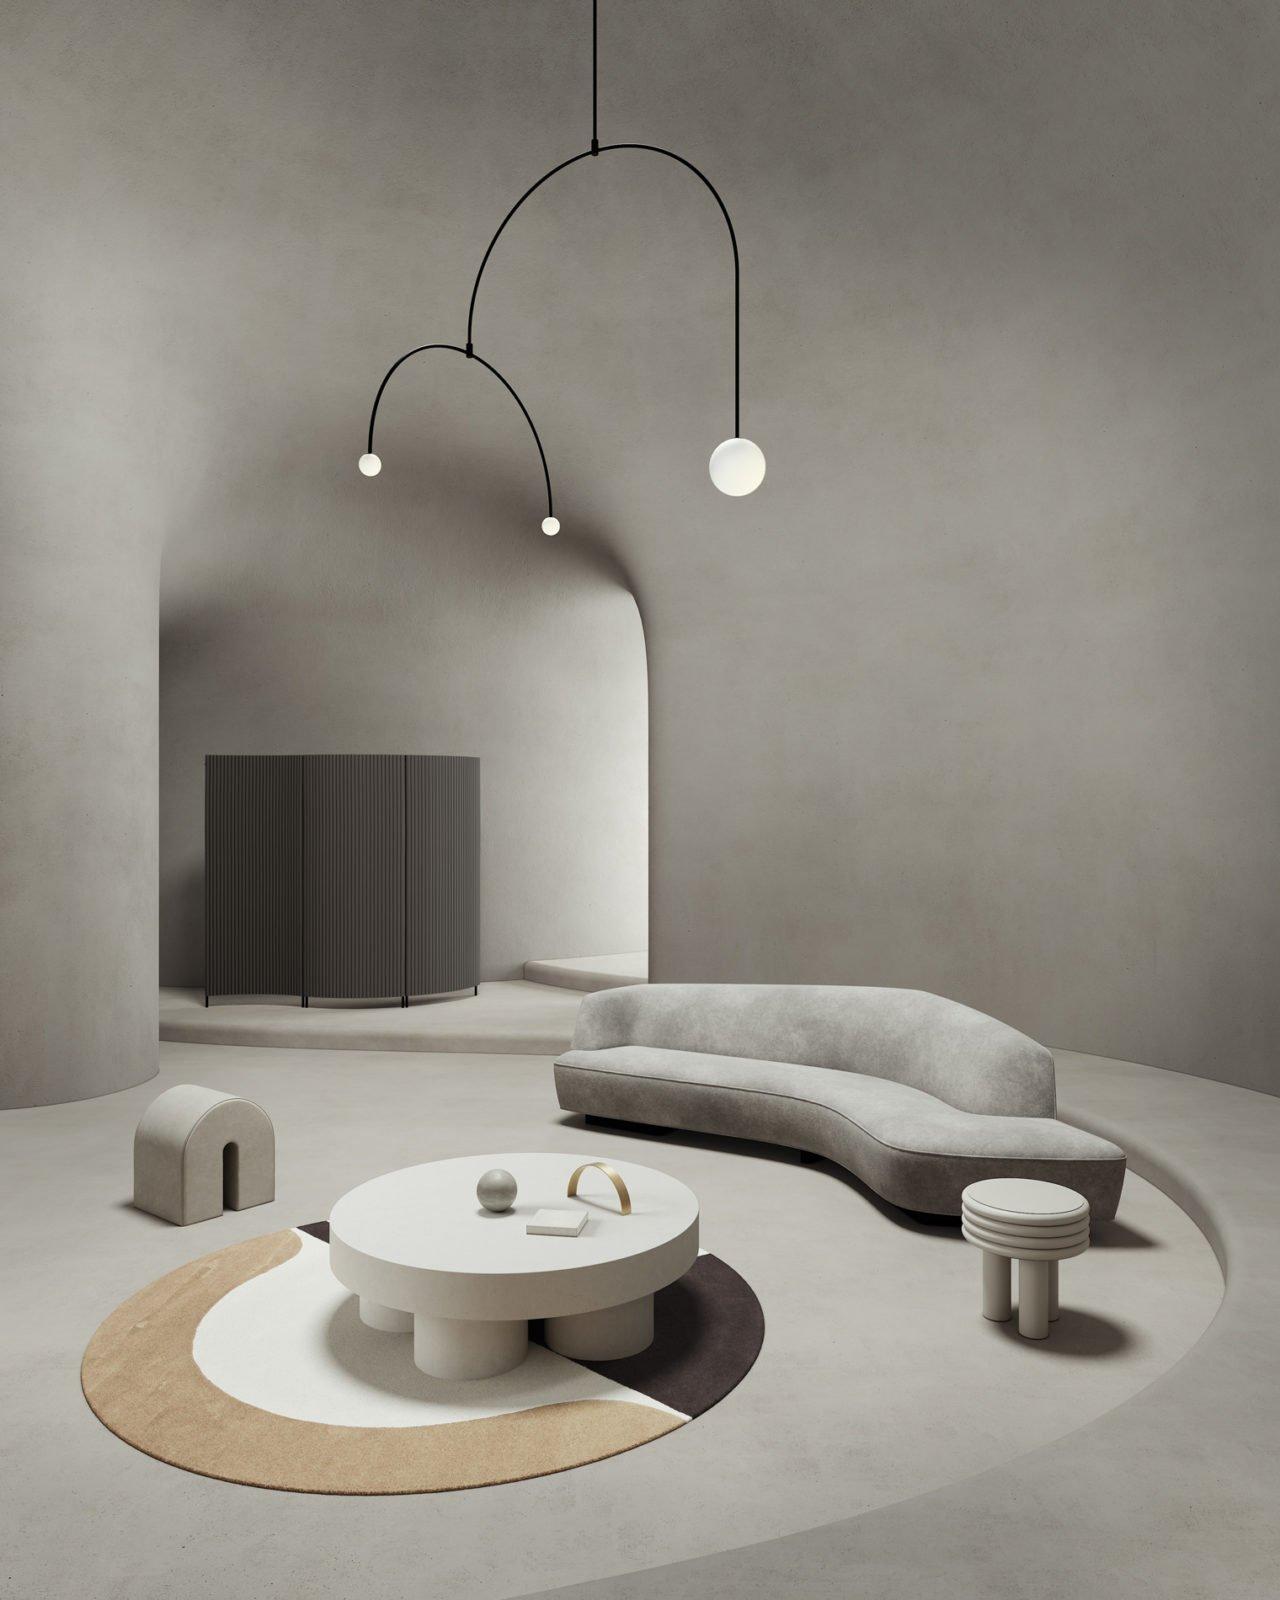 set-design-Cristina-Lello-Kyklos-huskdesignblog